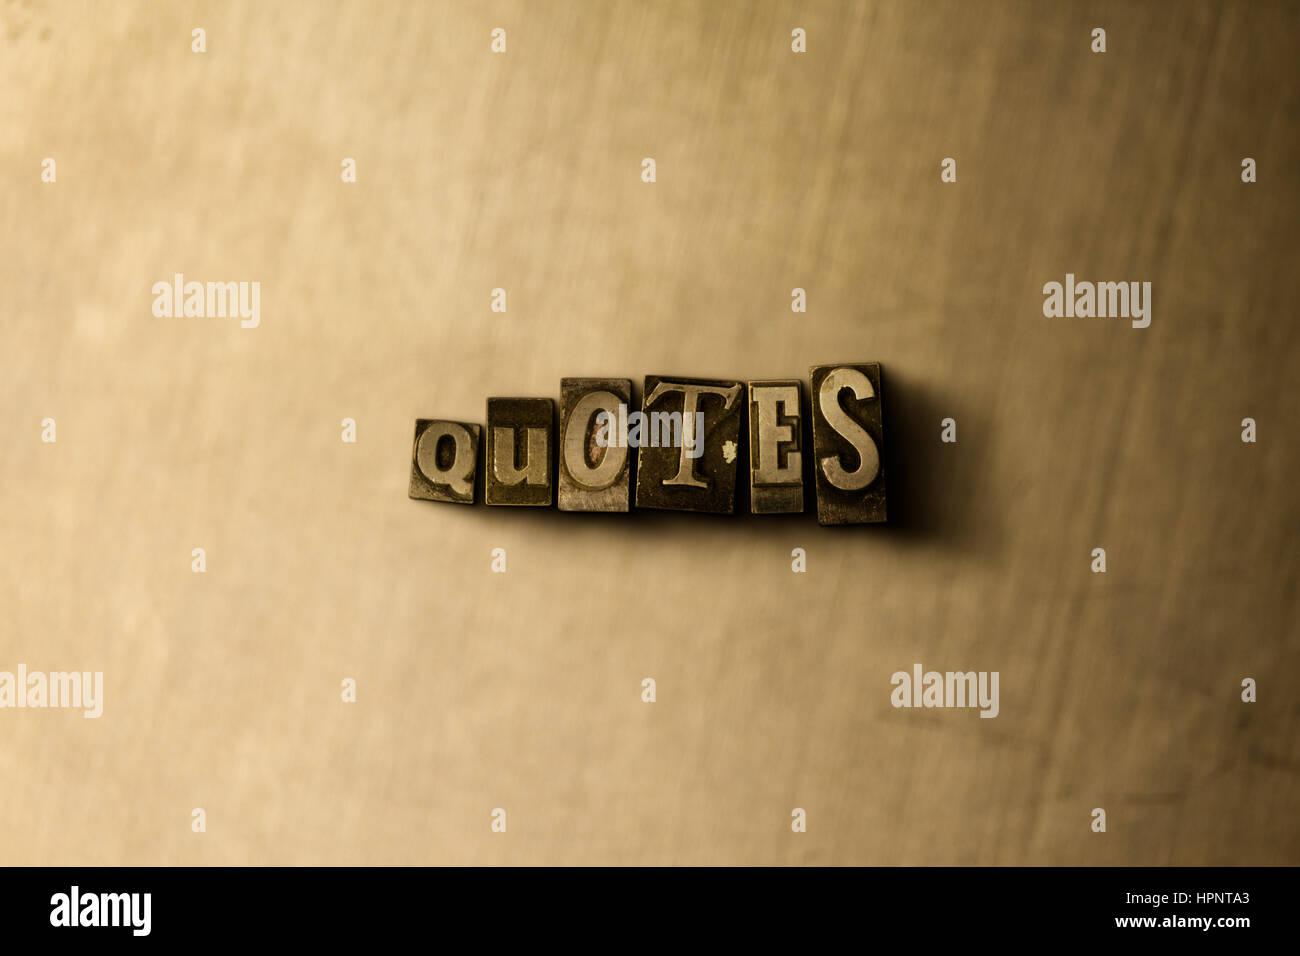 Metal Quotes Stock Photos & Metal Quotes Stock Images - Alamy